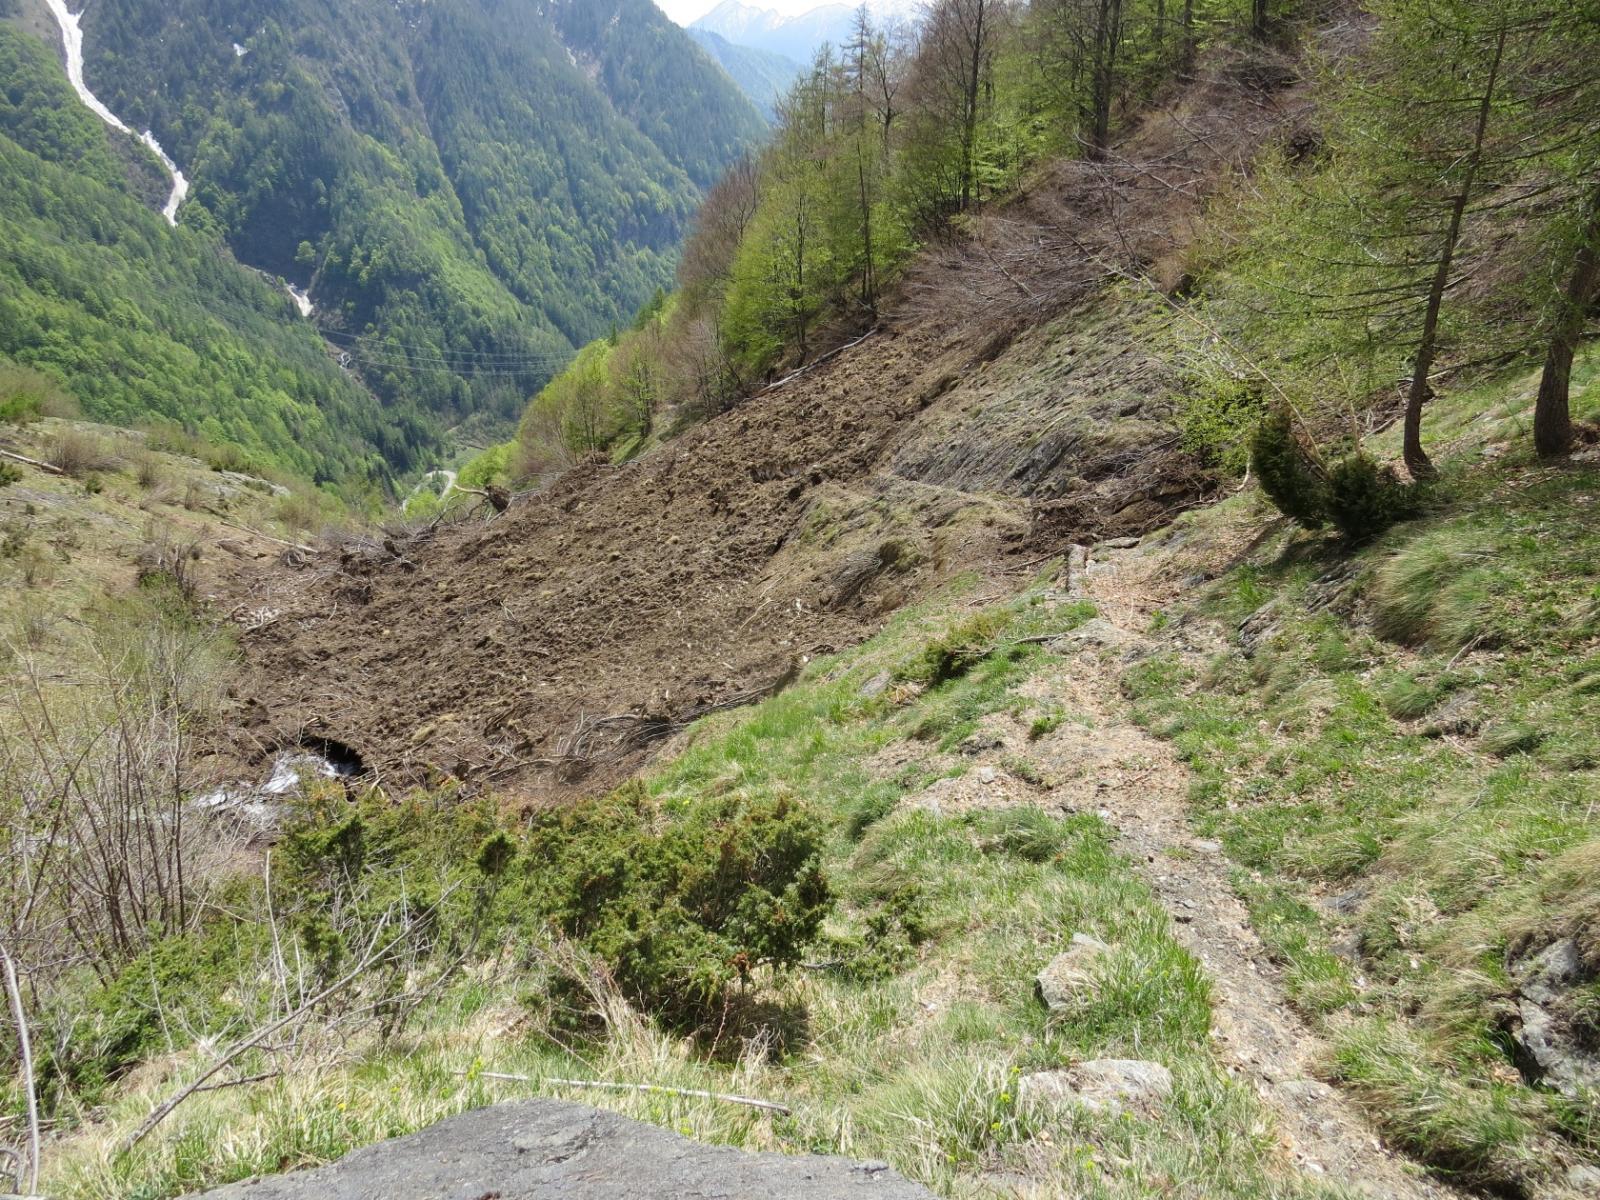 Valanga terrosa sul sentiero di discesa